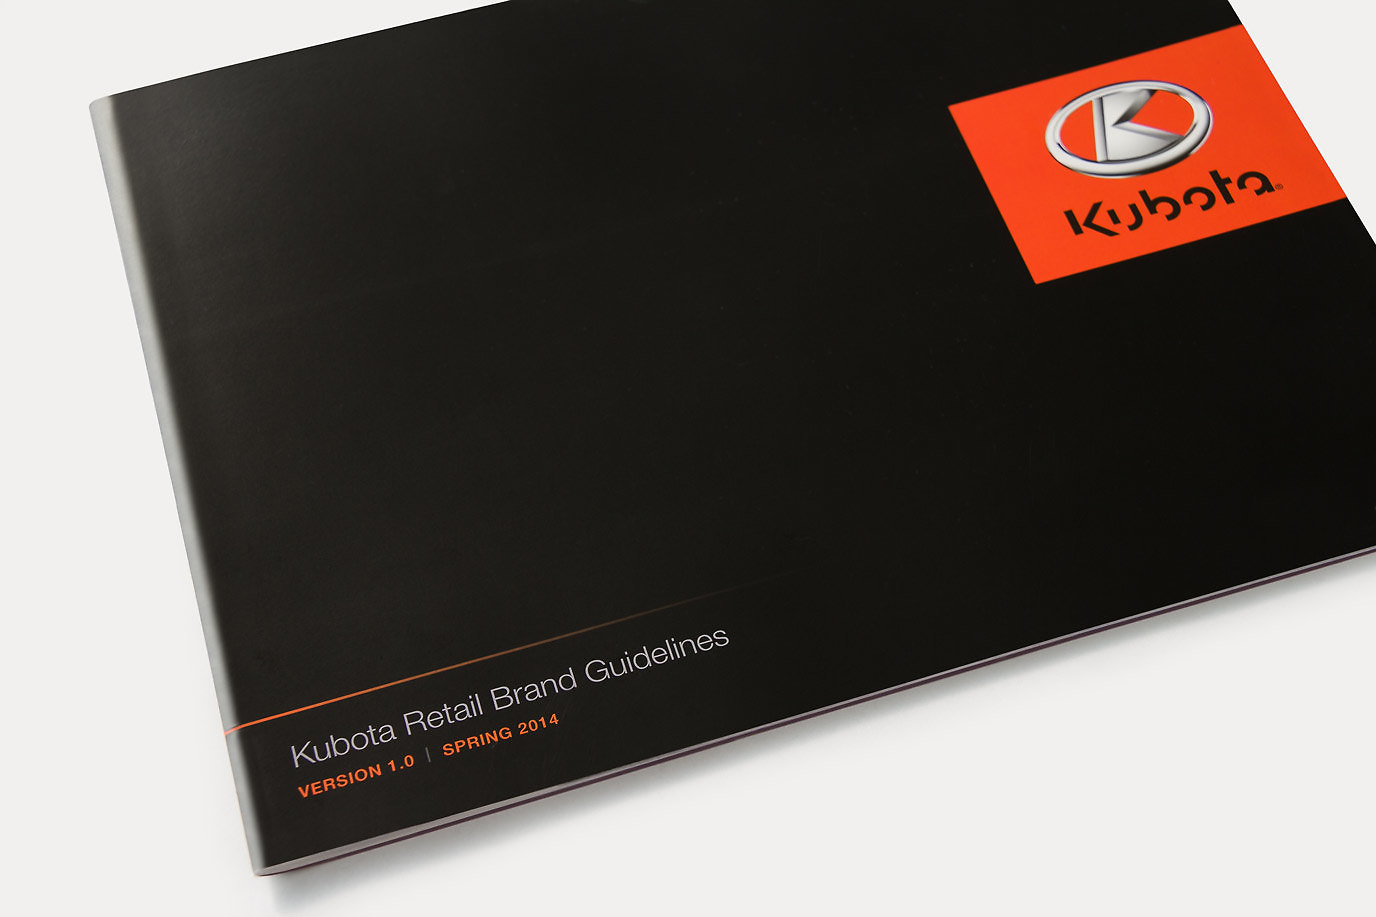 Kubota Retail Brand Guidelines cover